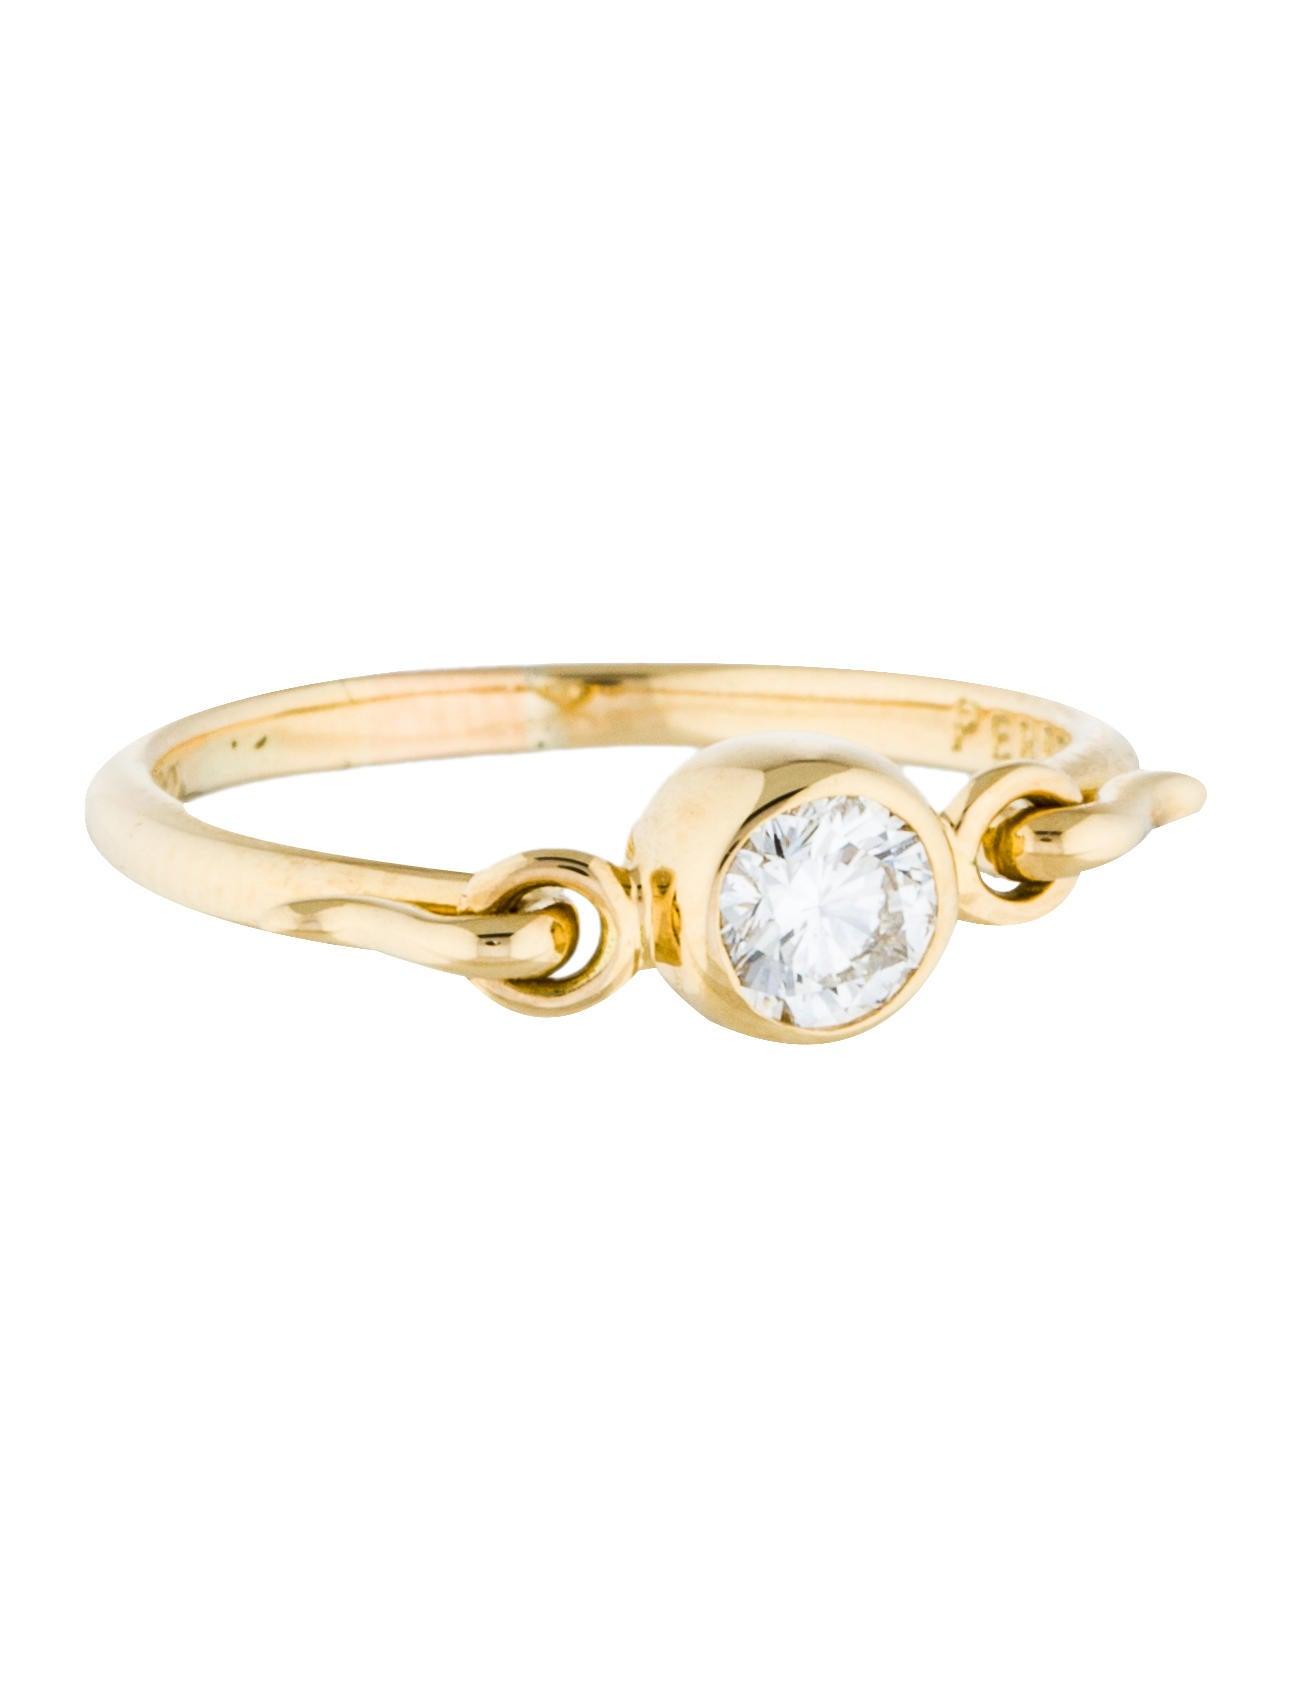 01956615f Tiffany & Co. 18K Diamond Swan Cocktail Ring - Rings - TIF50995 ...